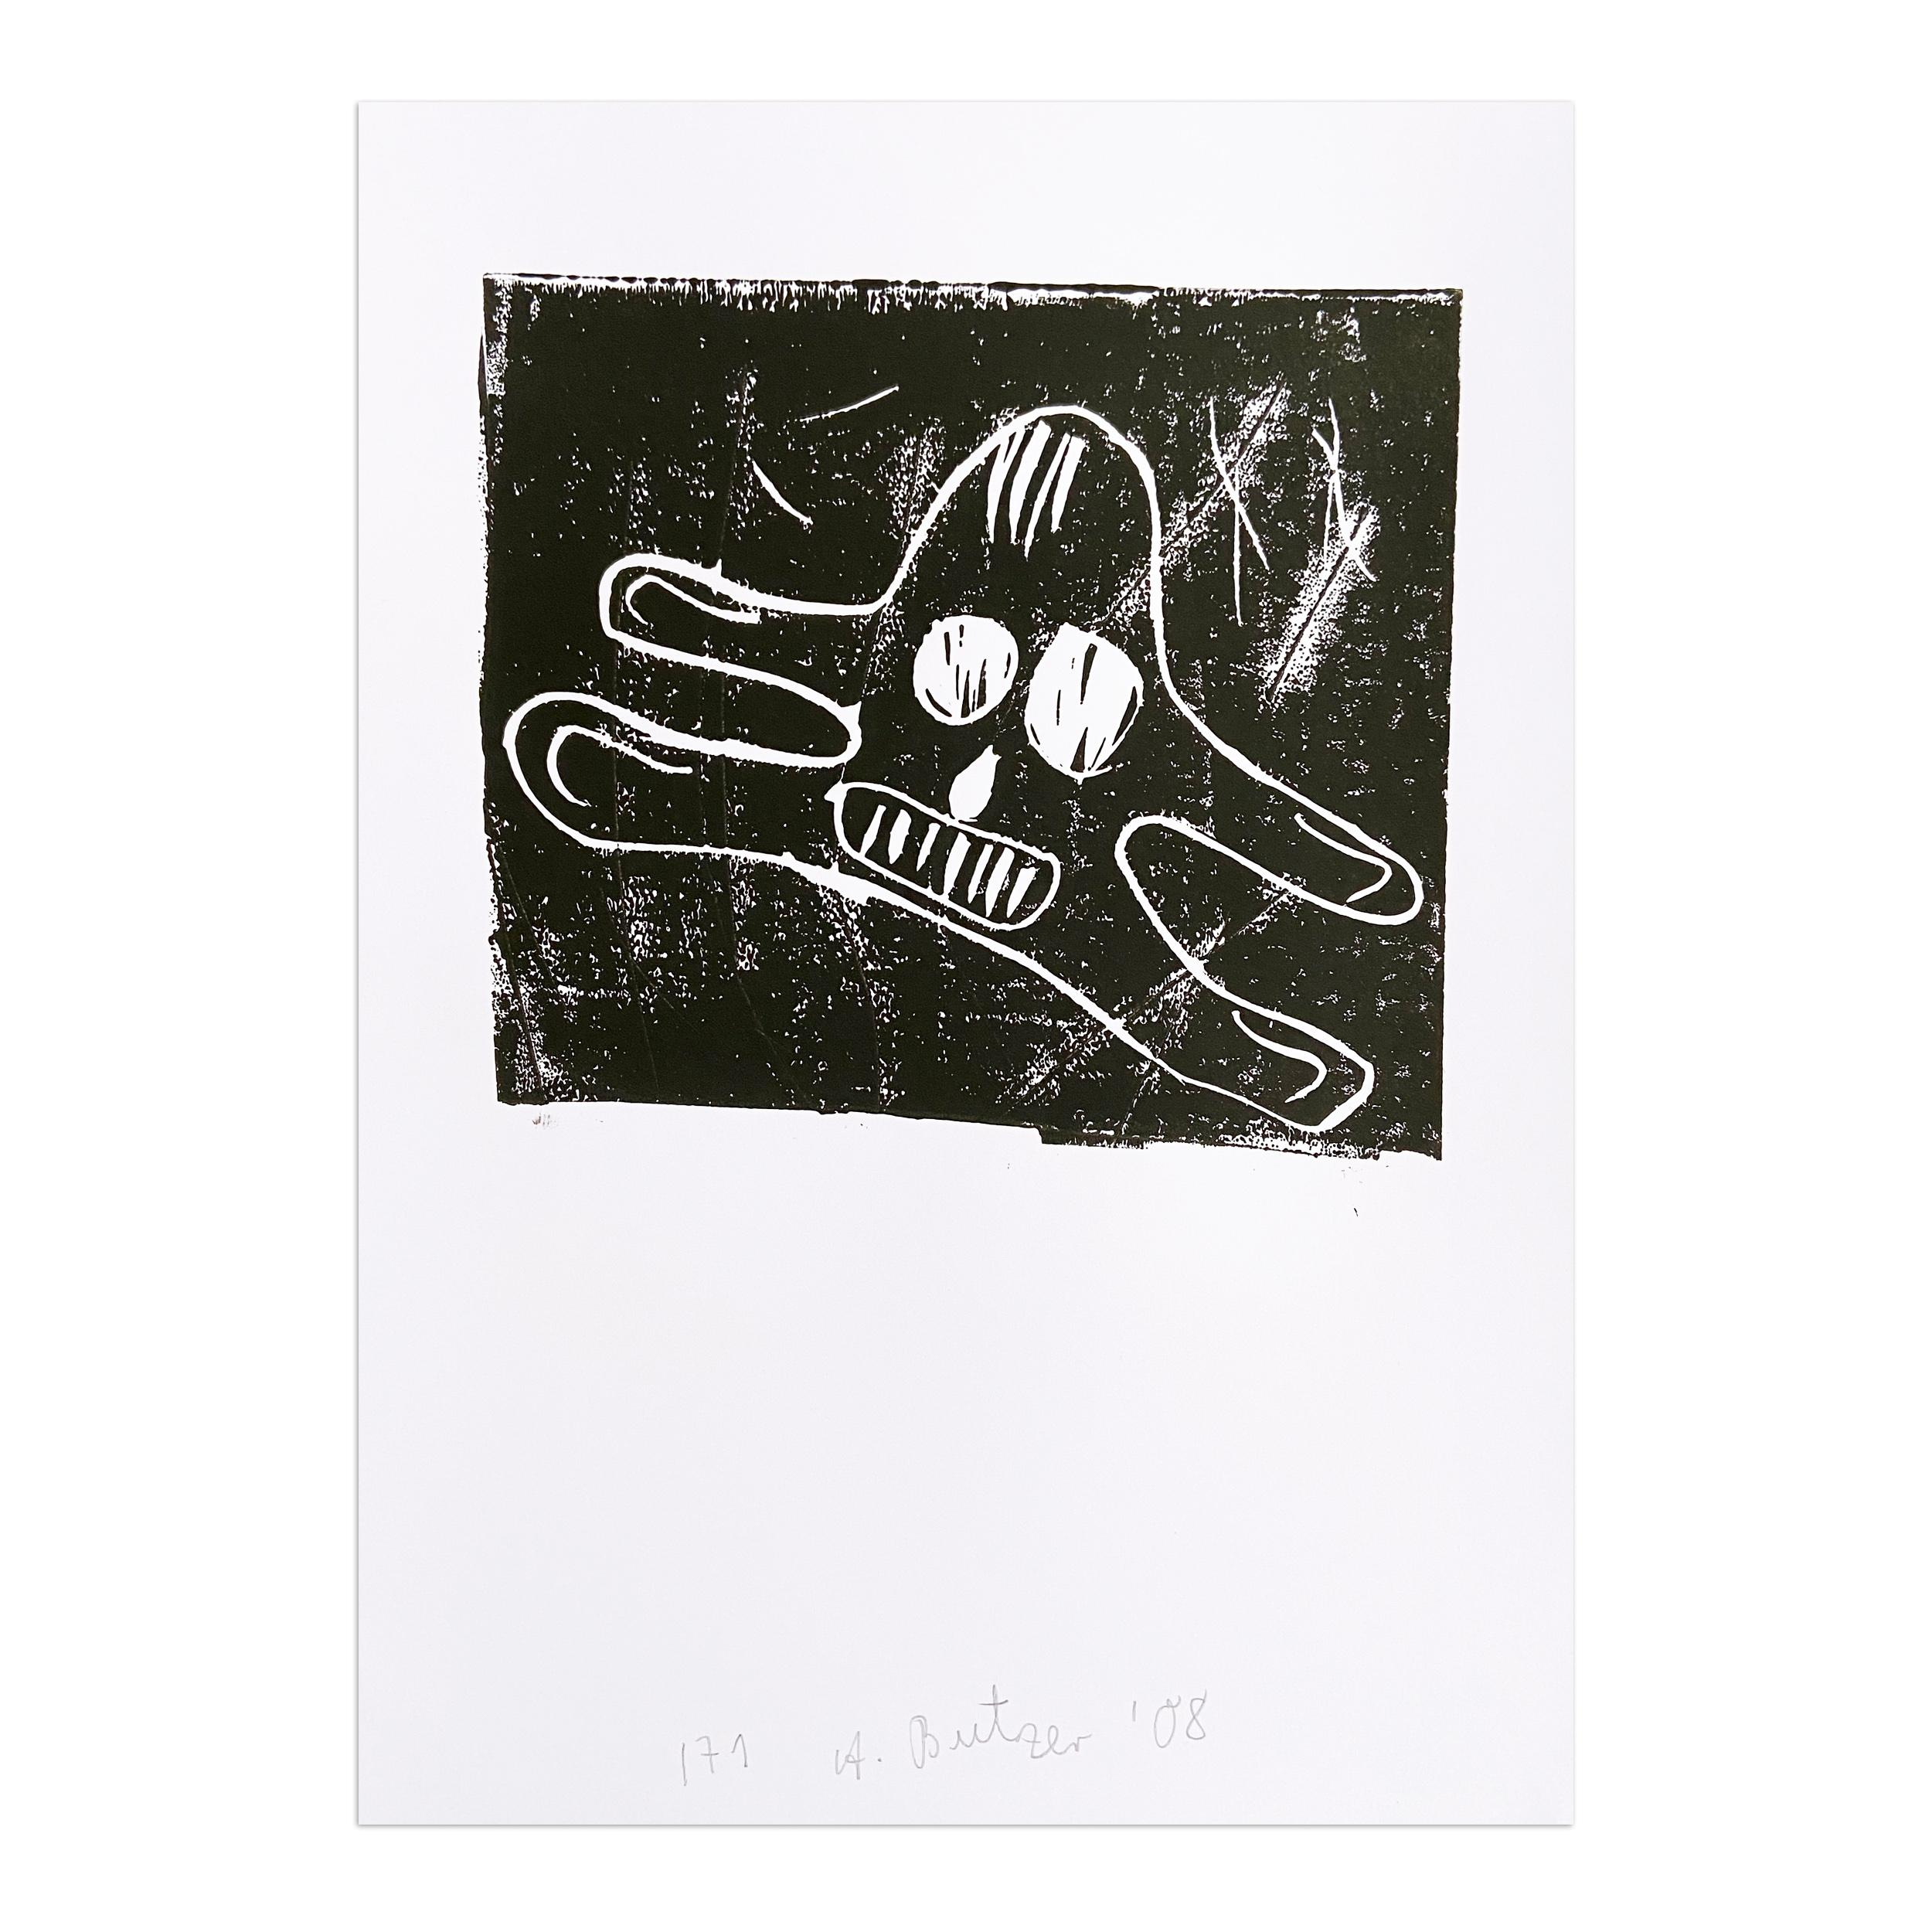 Untitled, Linocut, Contemporary Art, Pop Art, Neo-Expressionism